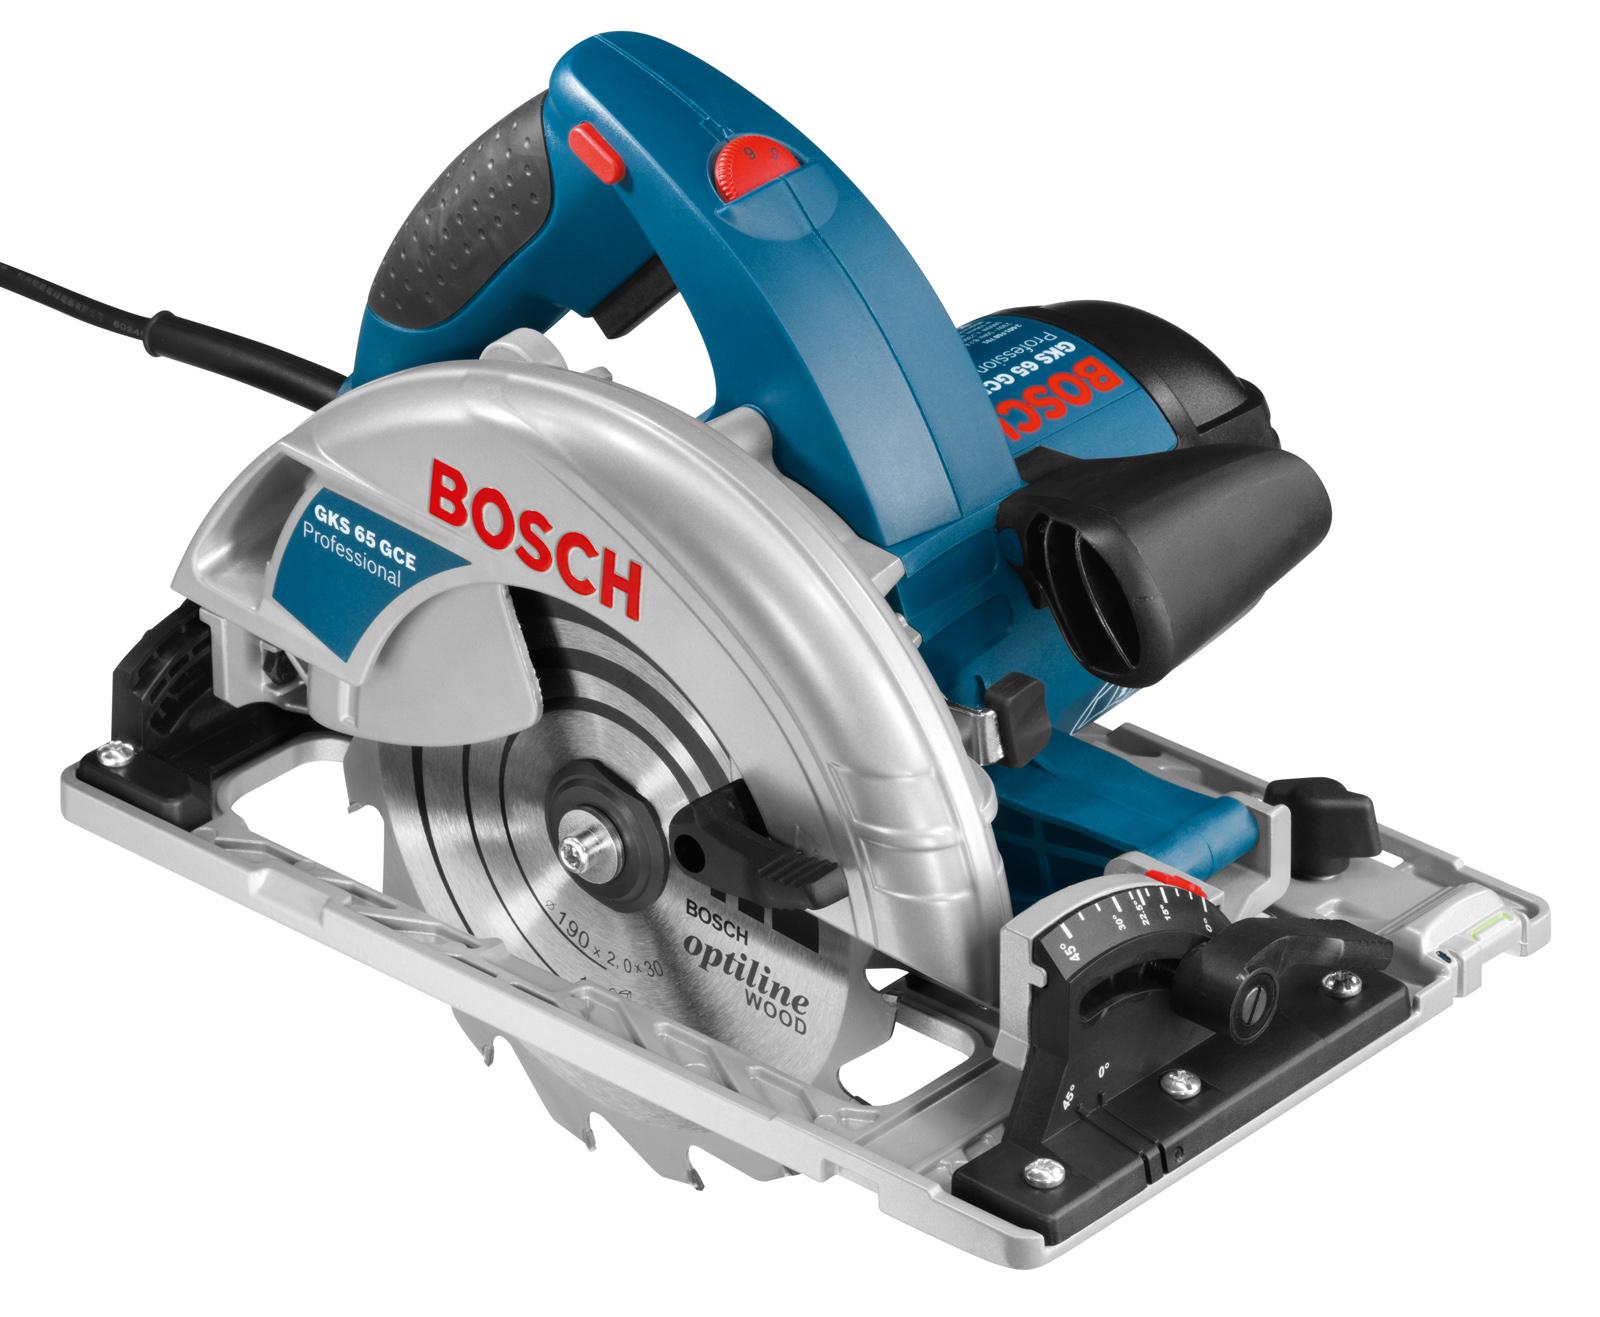 Пила циркулярная Bosch Gks 65 gce